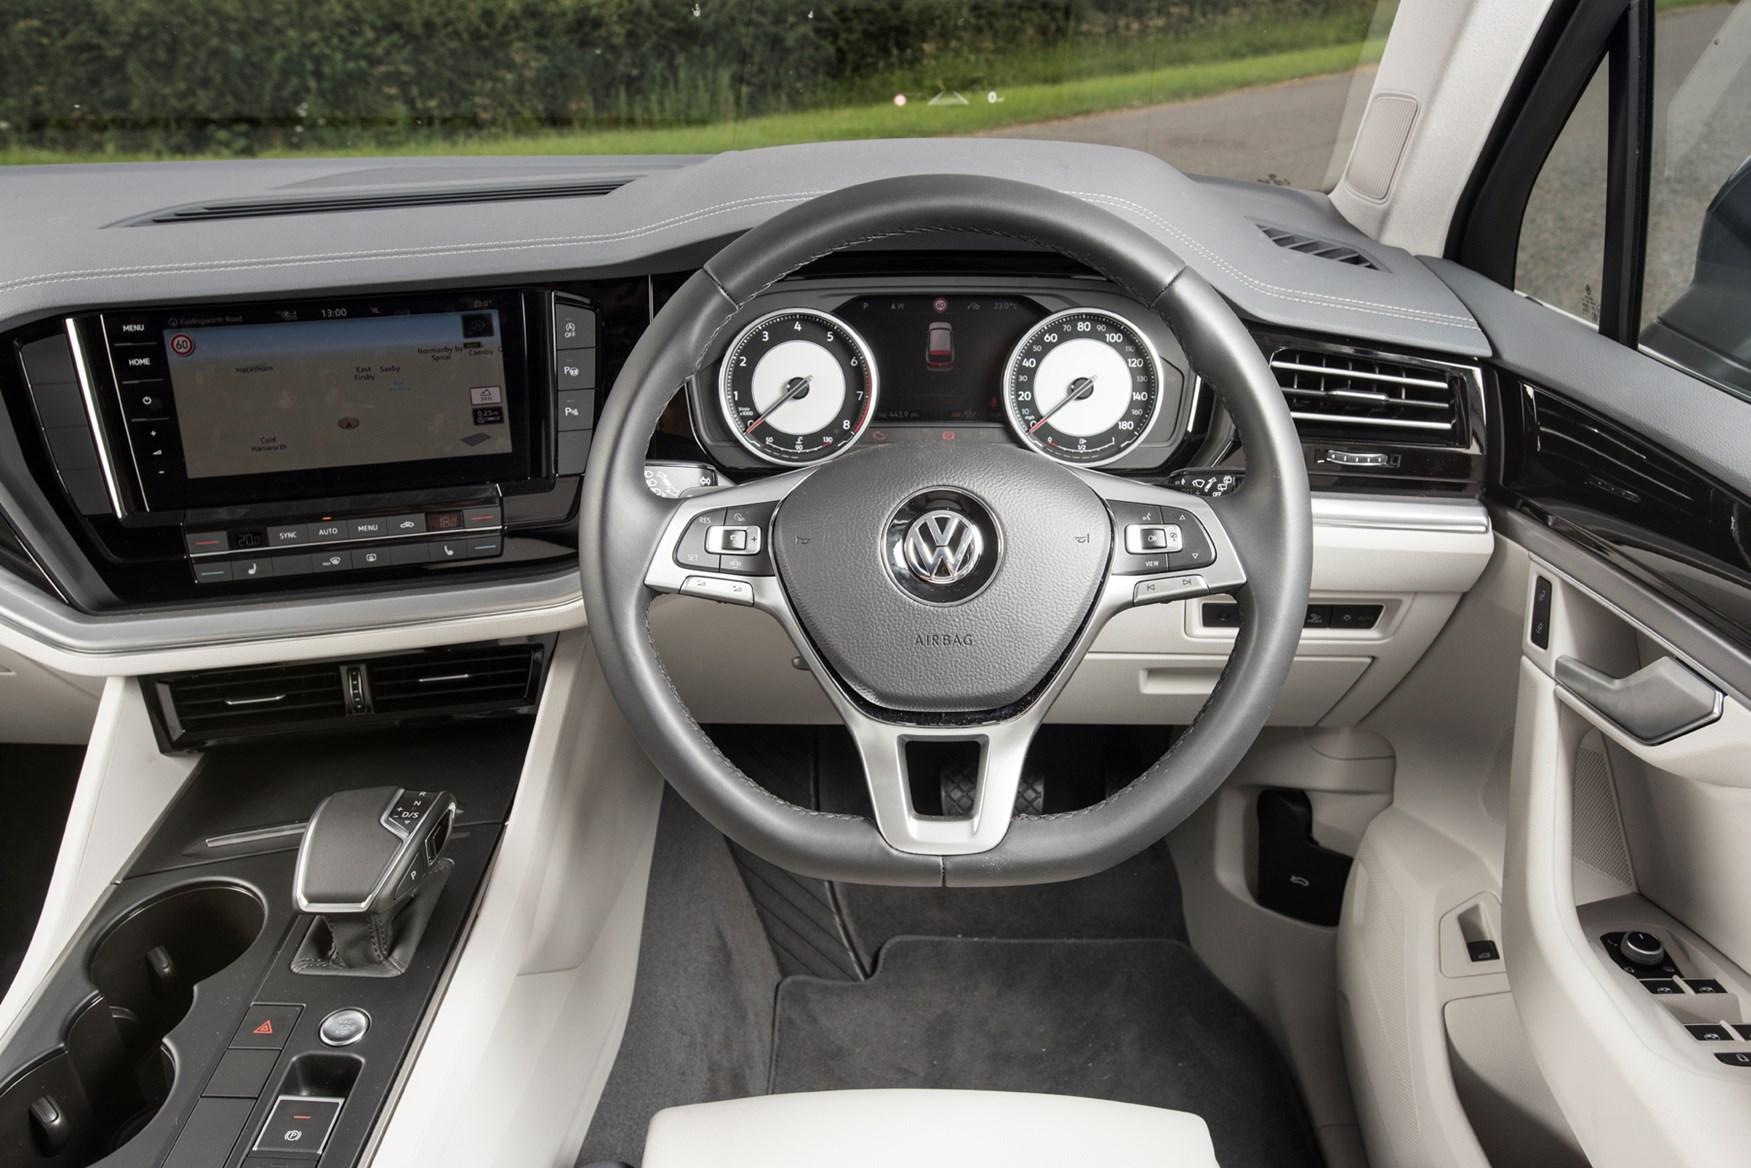 2019 Volkswagen Touareg SUV dashboard without Innovision Cockpit